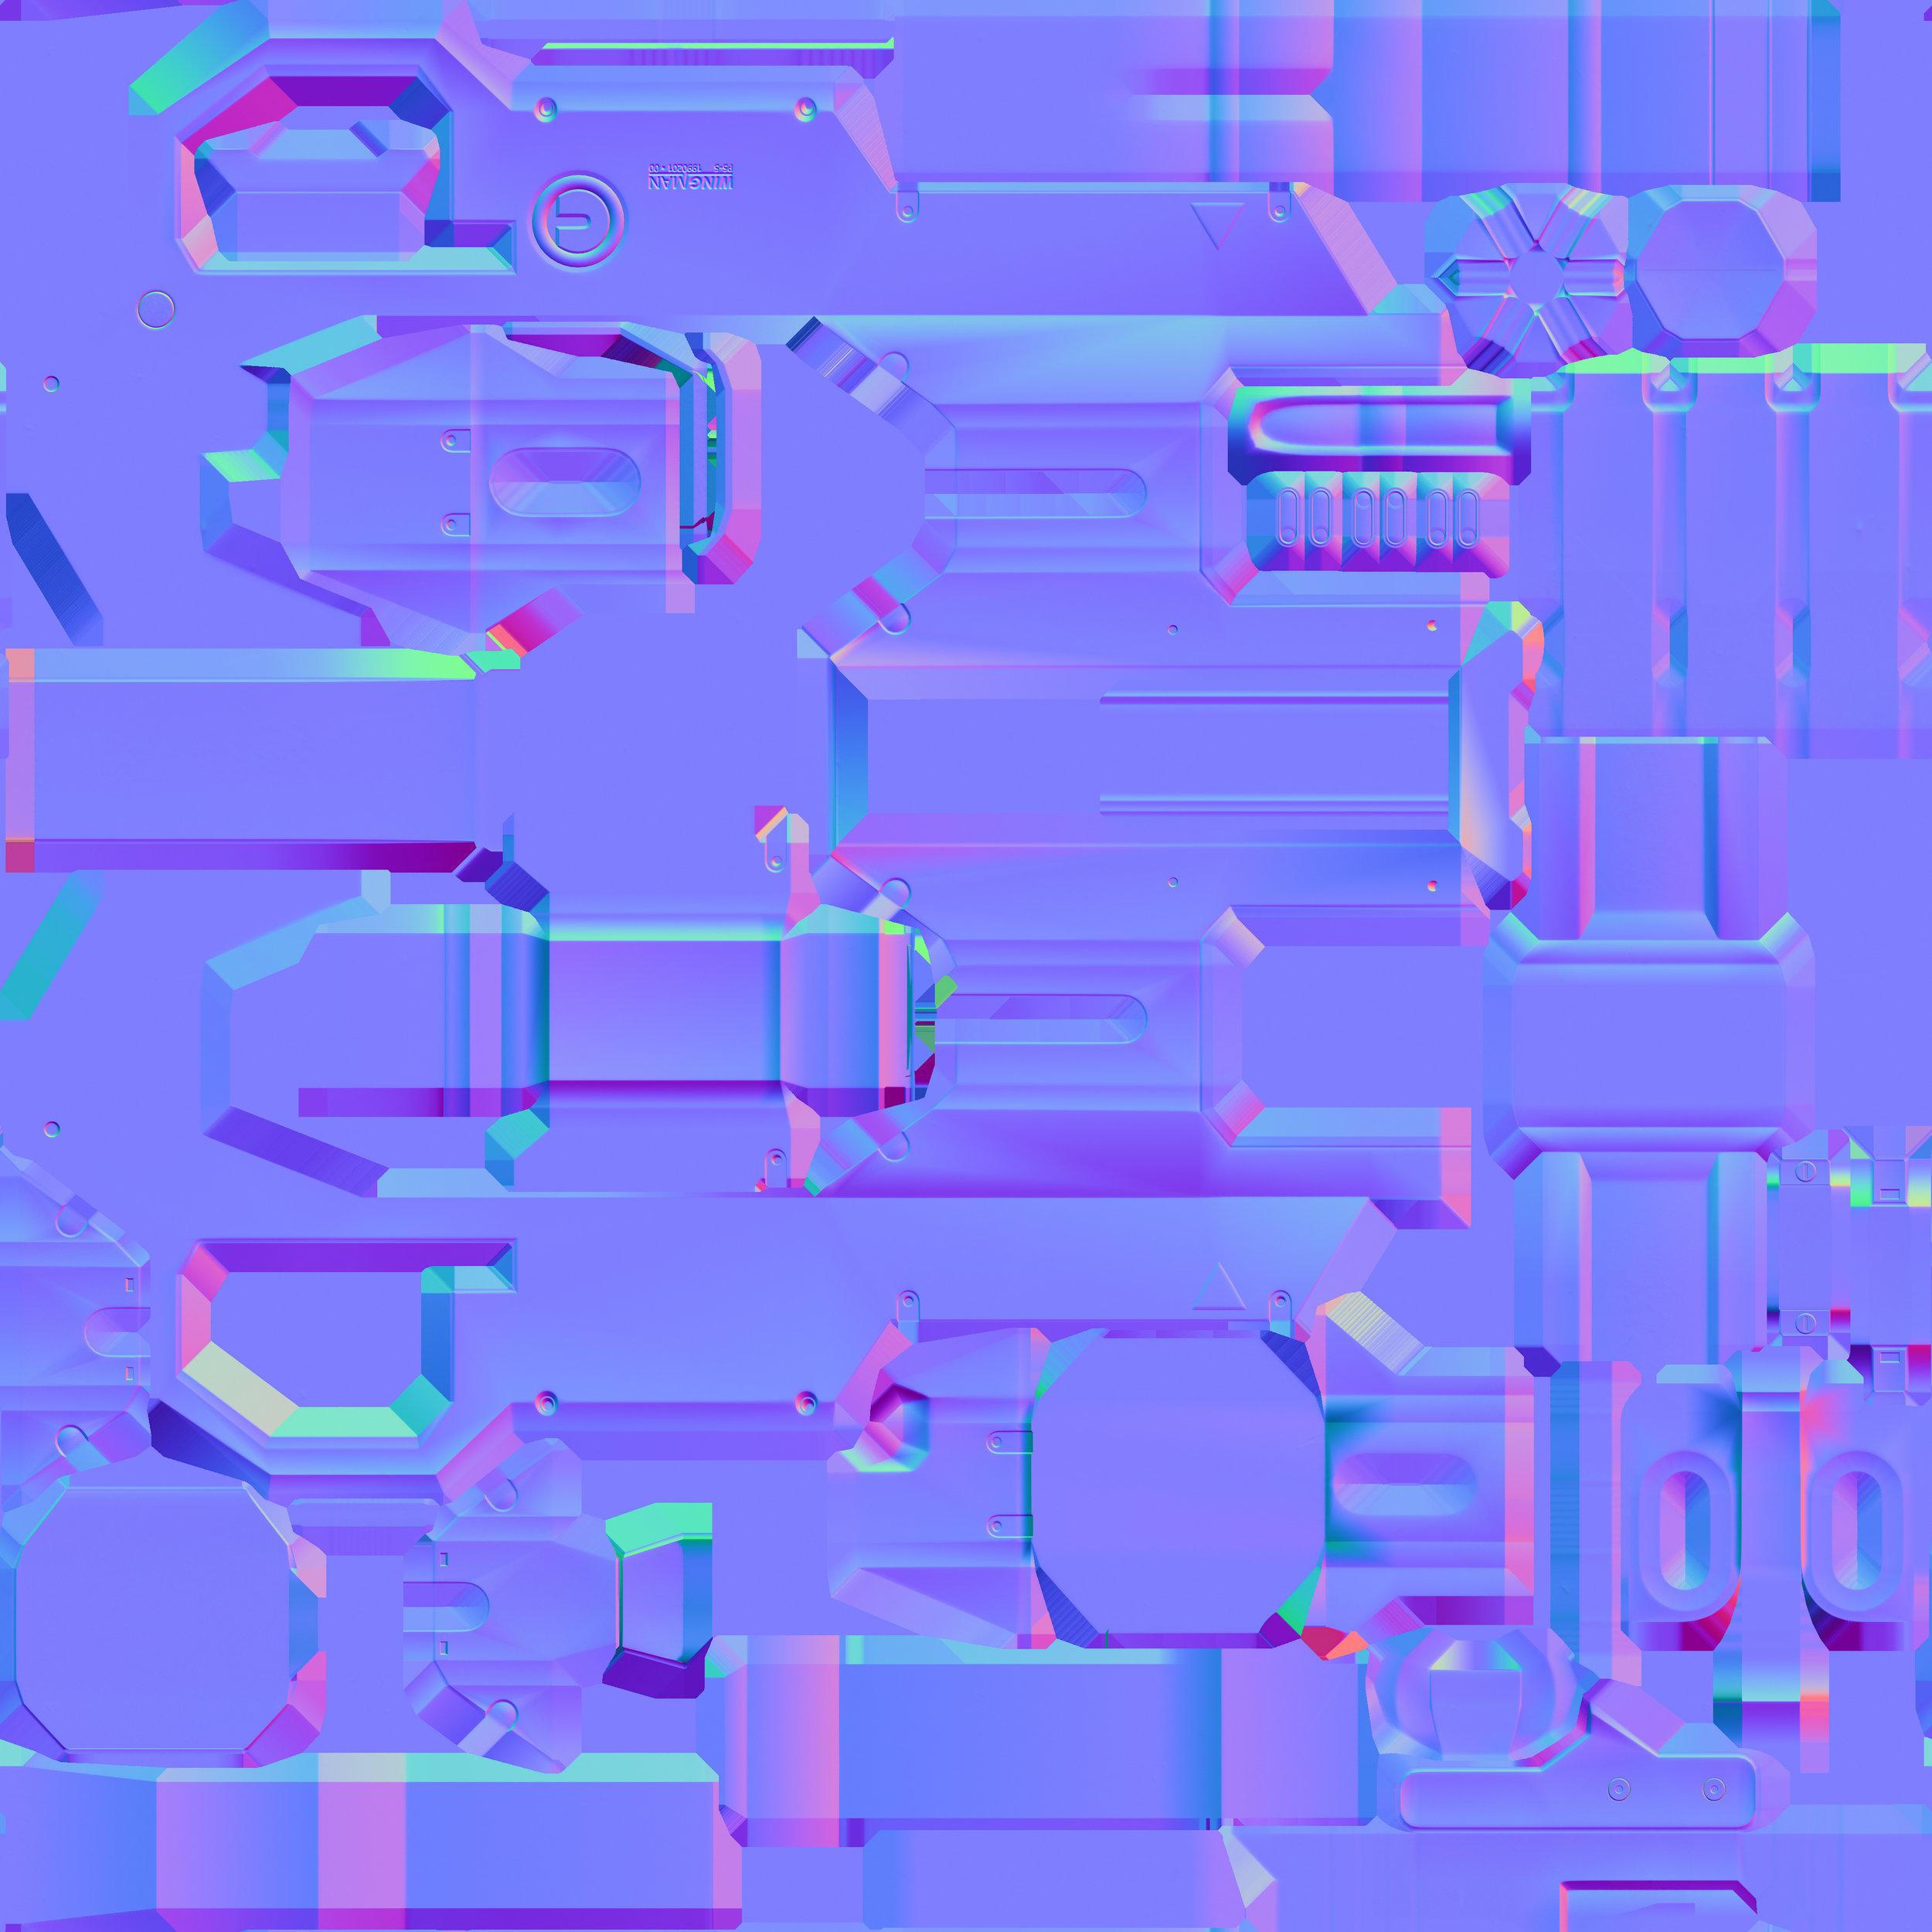 b_n.jpg